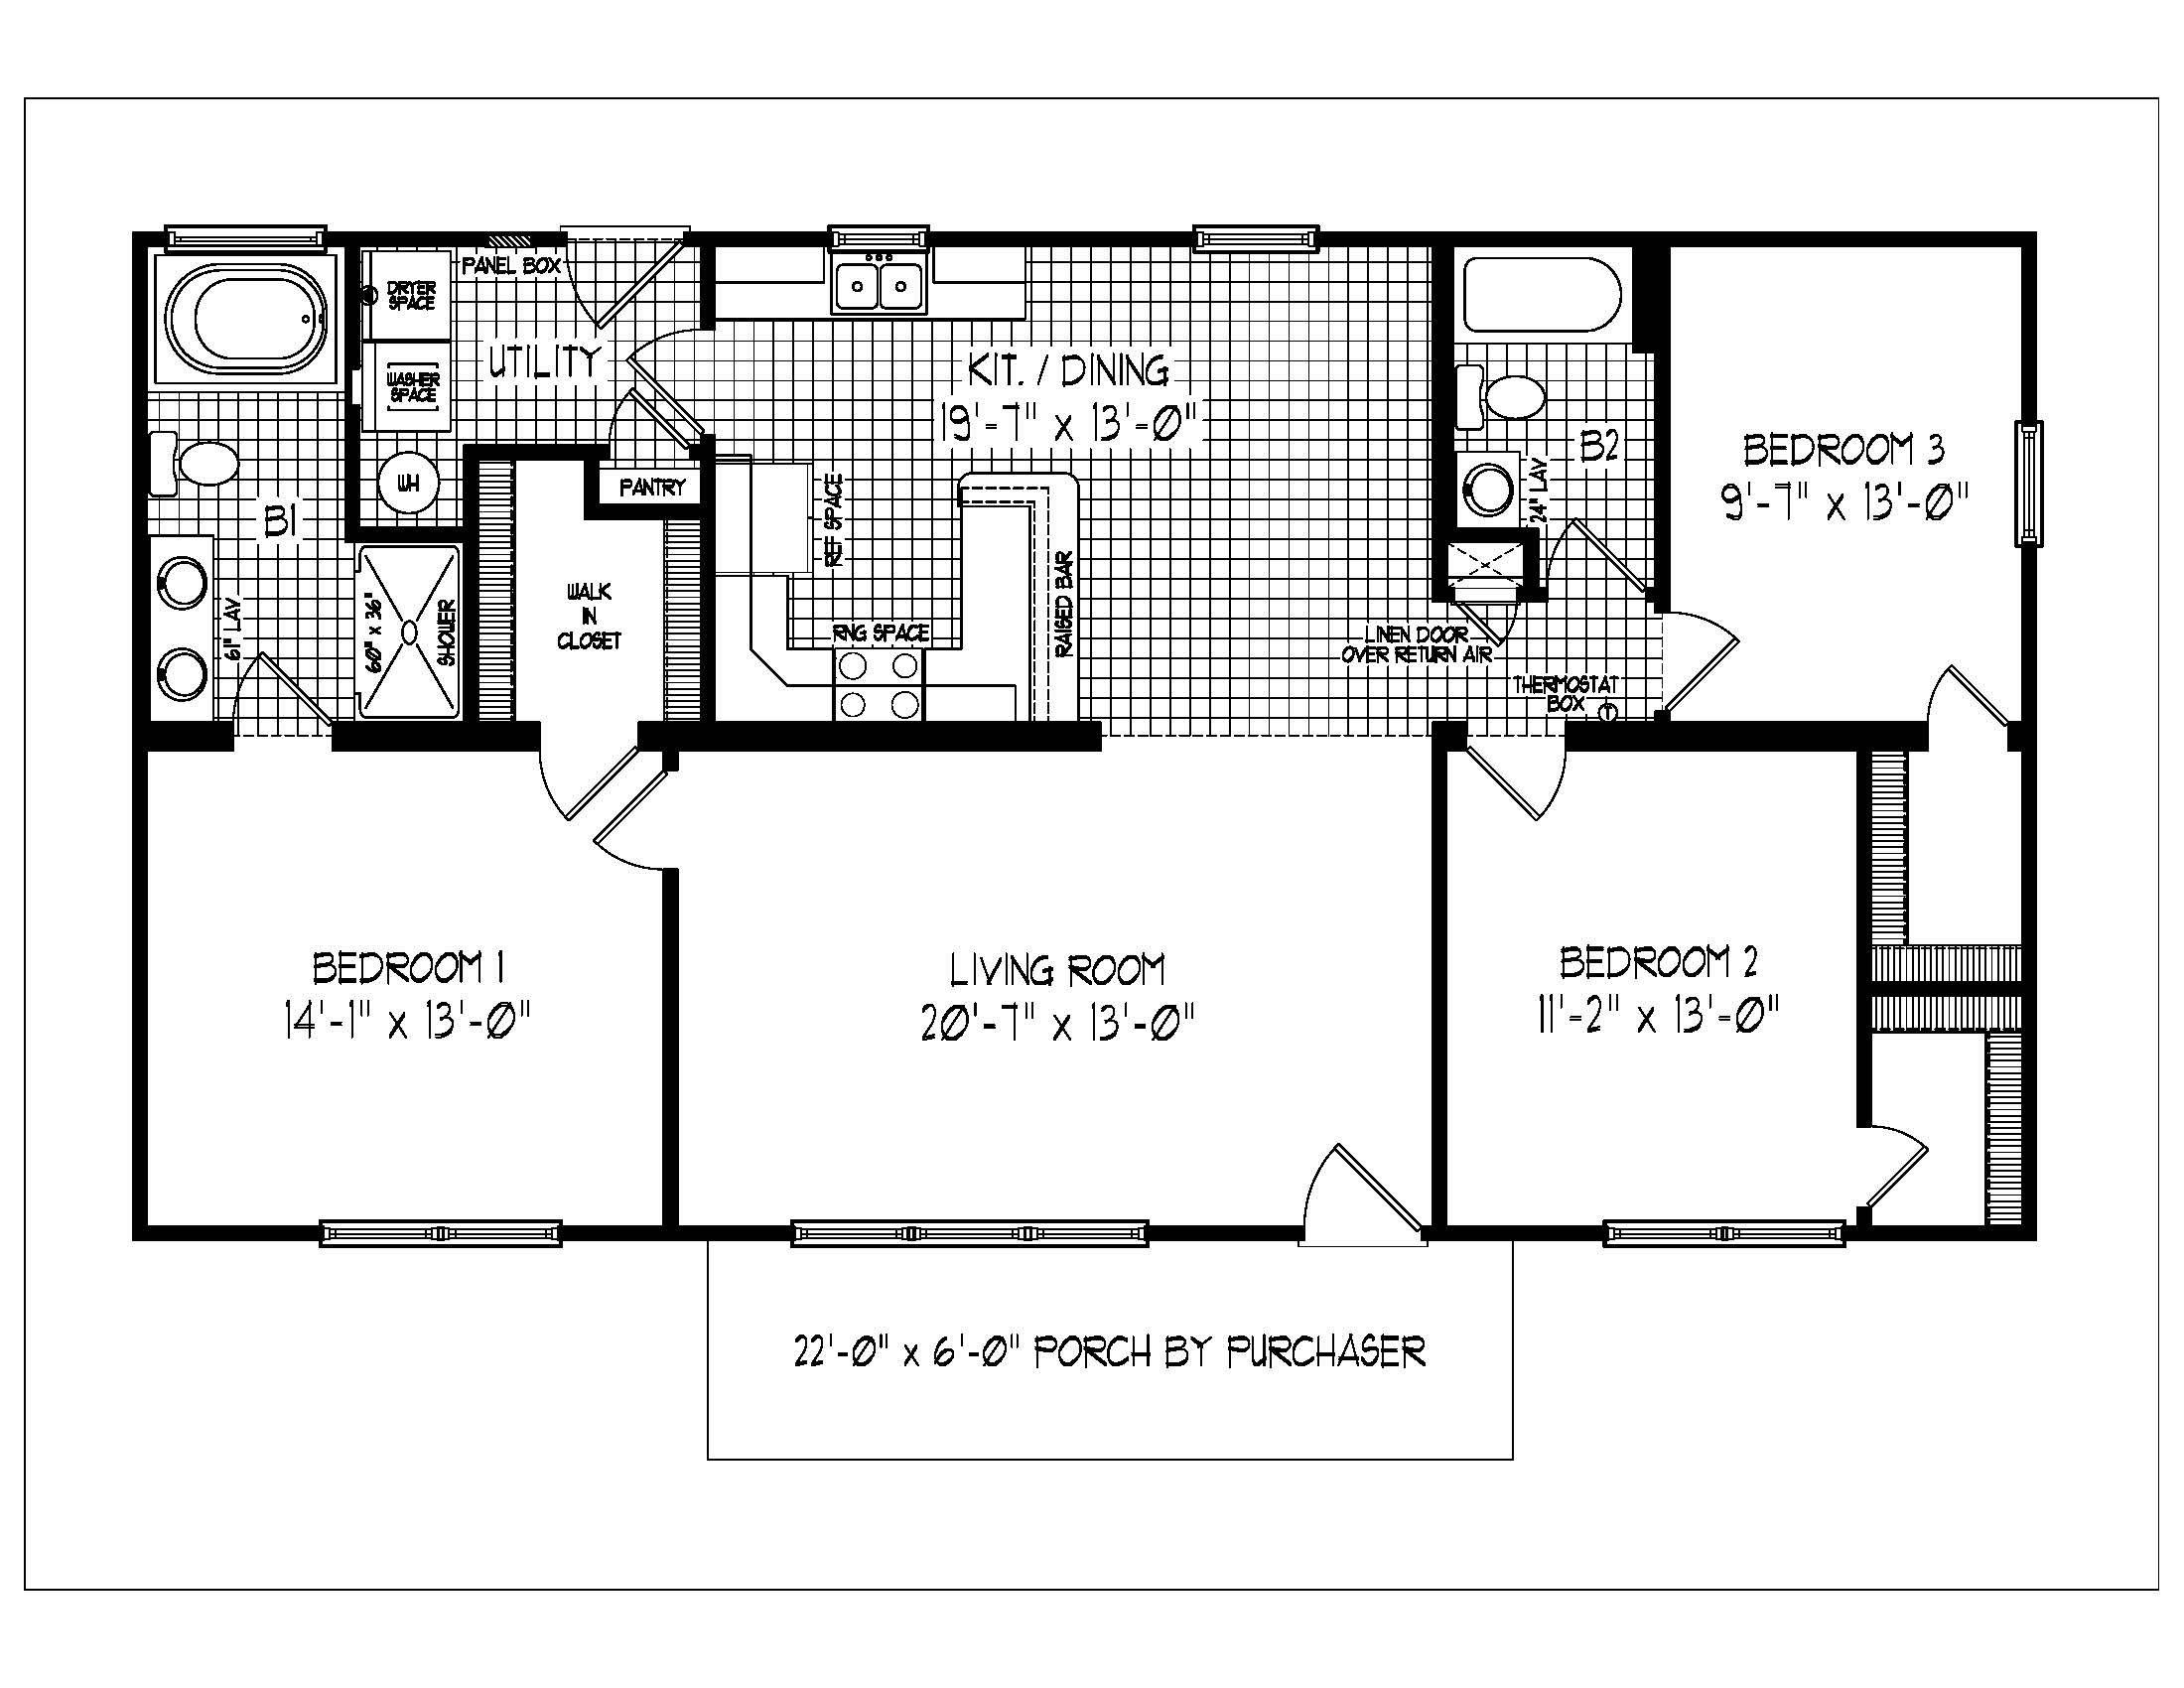 Cole Custom Modular Homes Custom Modular Homes Modular Home Floor Plans Modular Homes